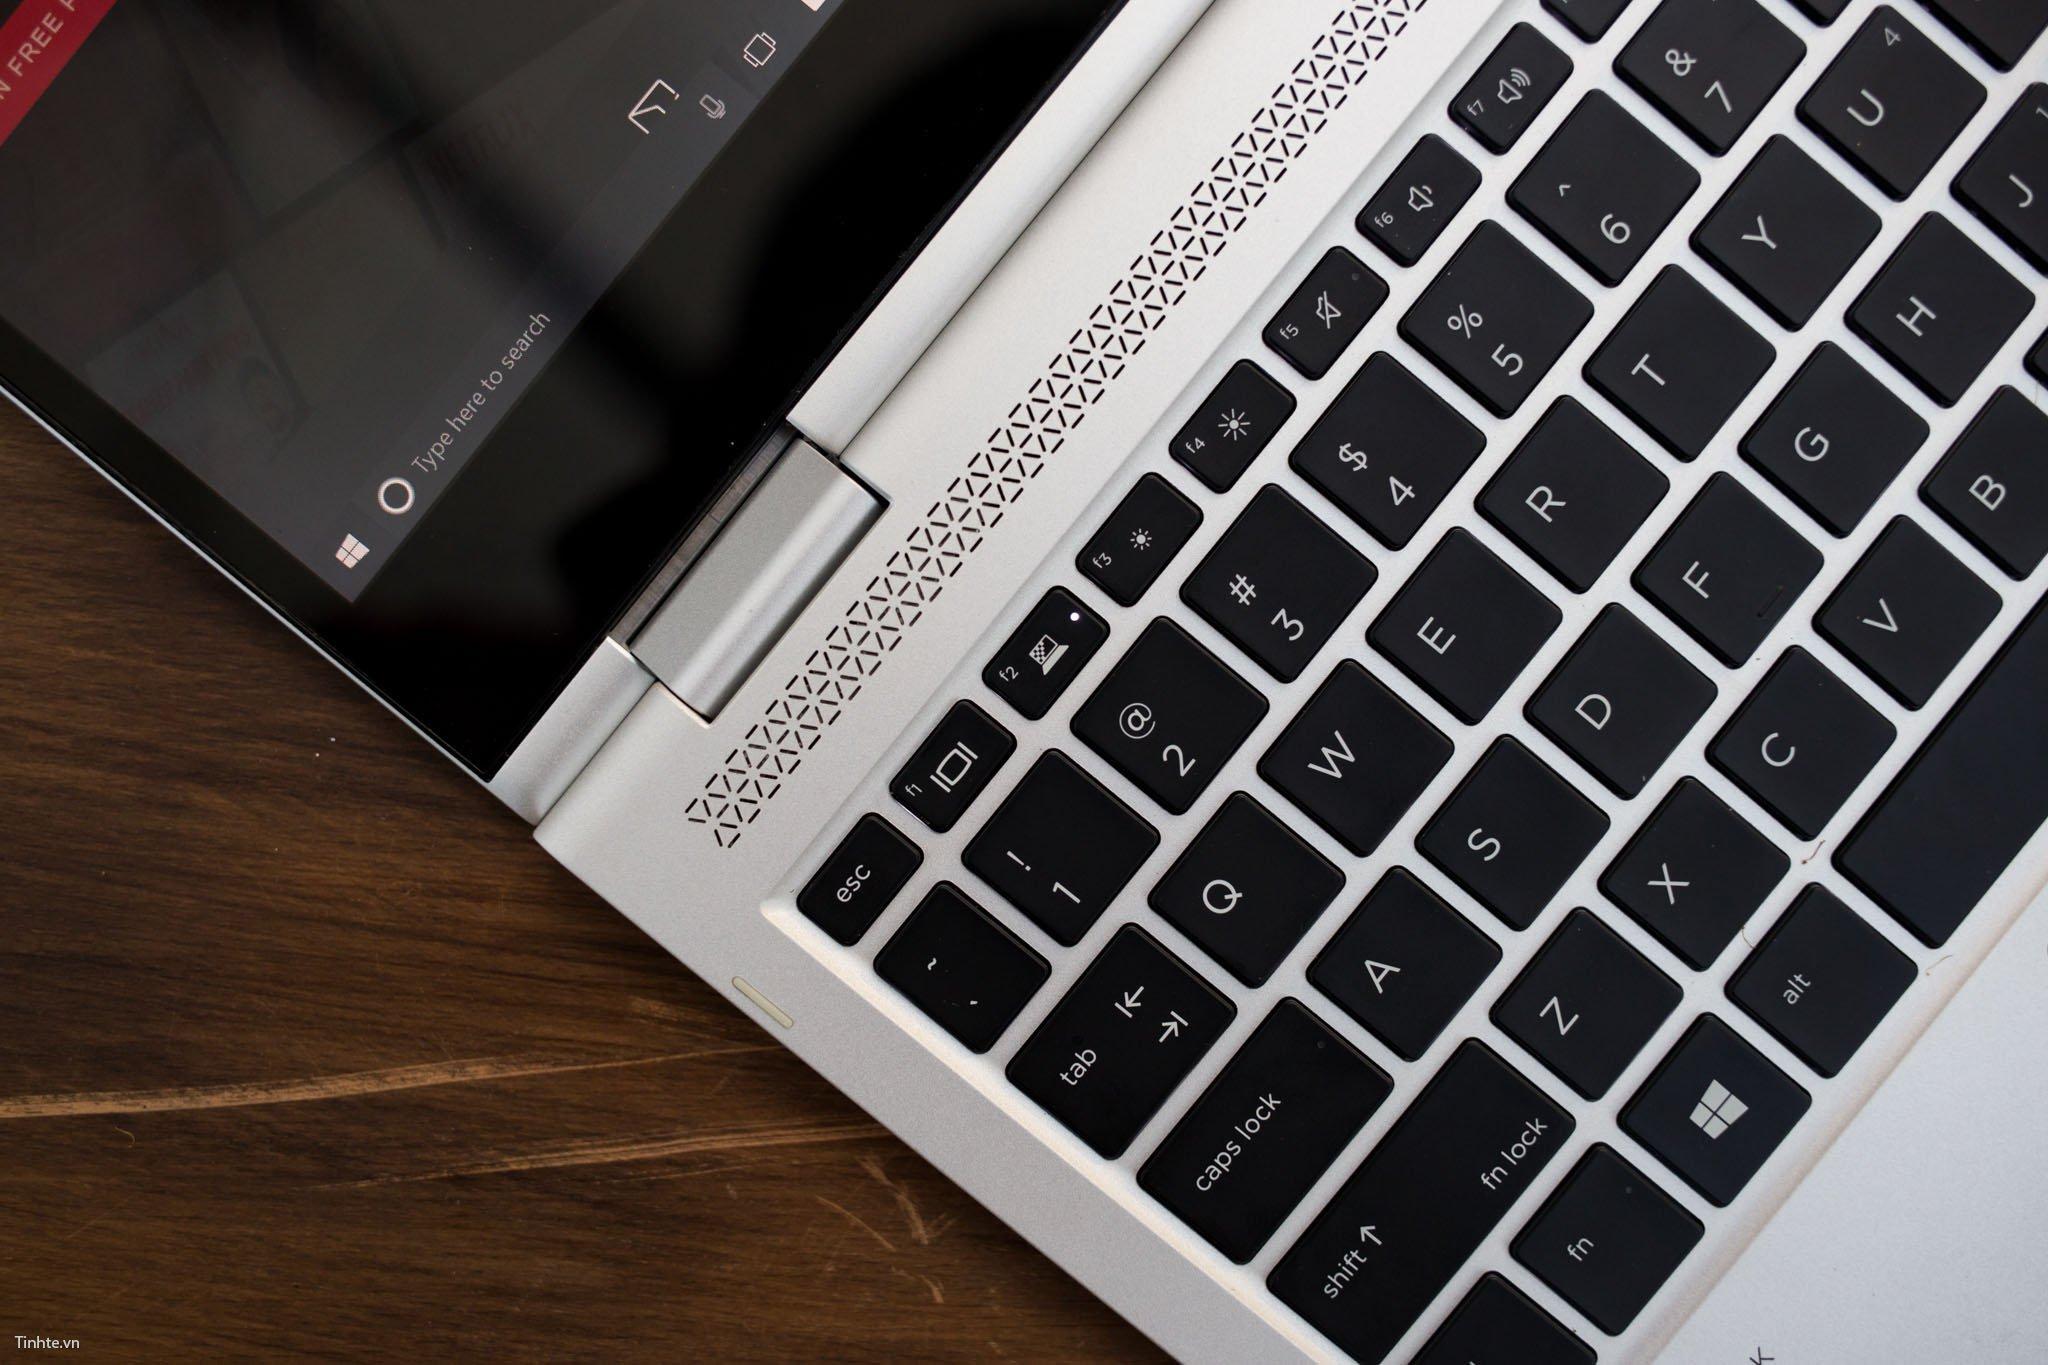 EliteBook x360 l